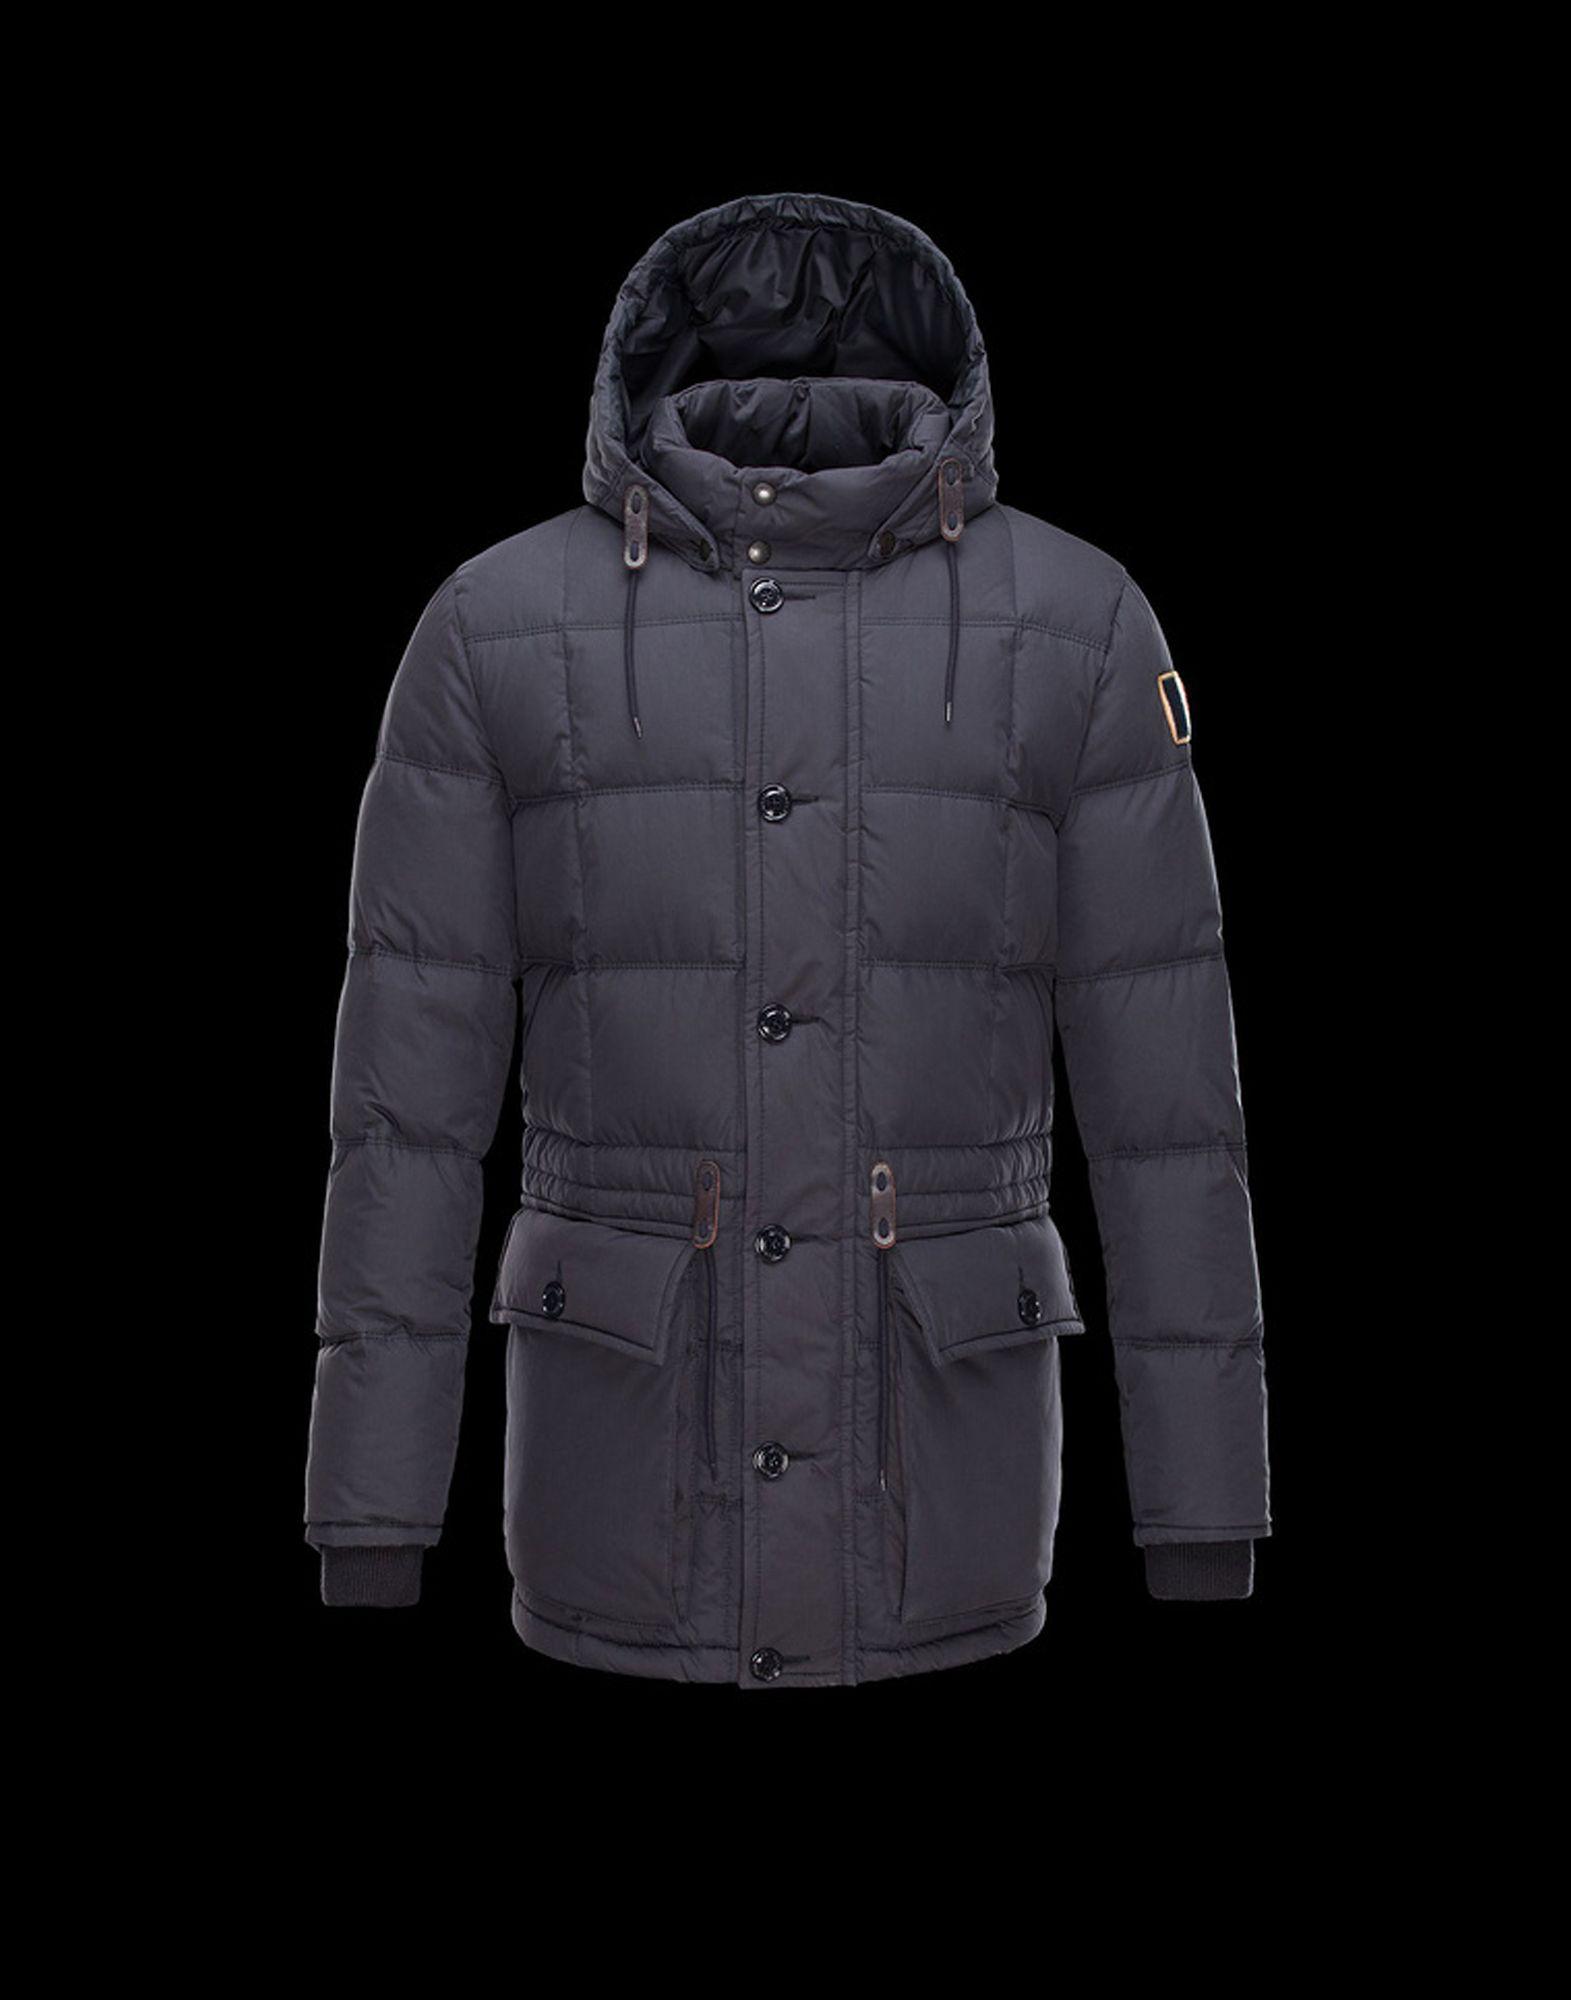 newest 88355 adb89 MONCLER MONTSERRAT | Moncler Coat For Man | Moncler jacket ...